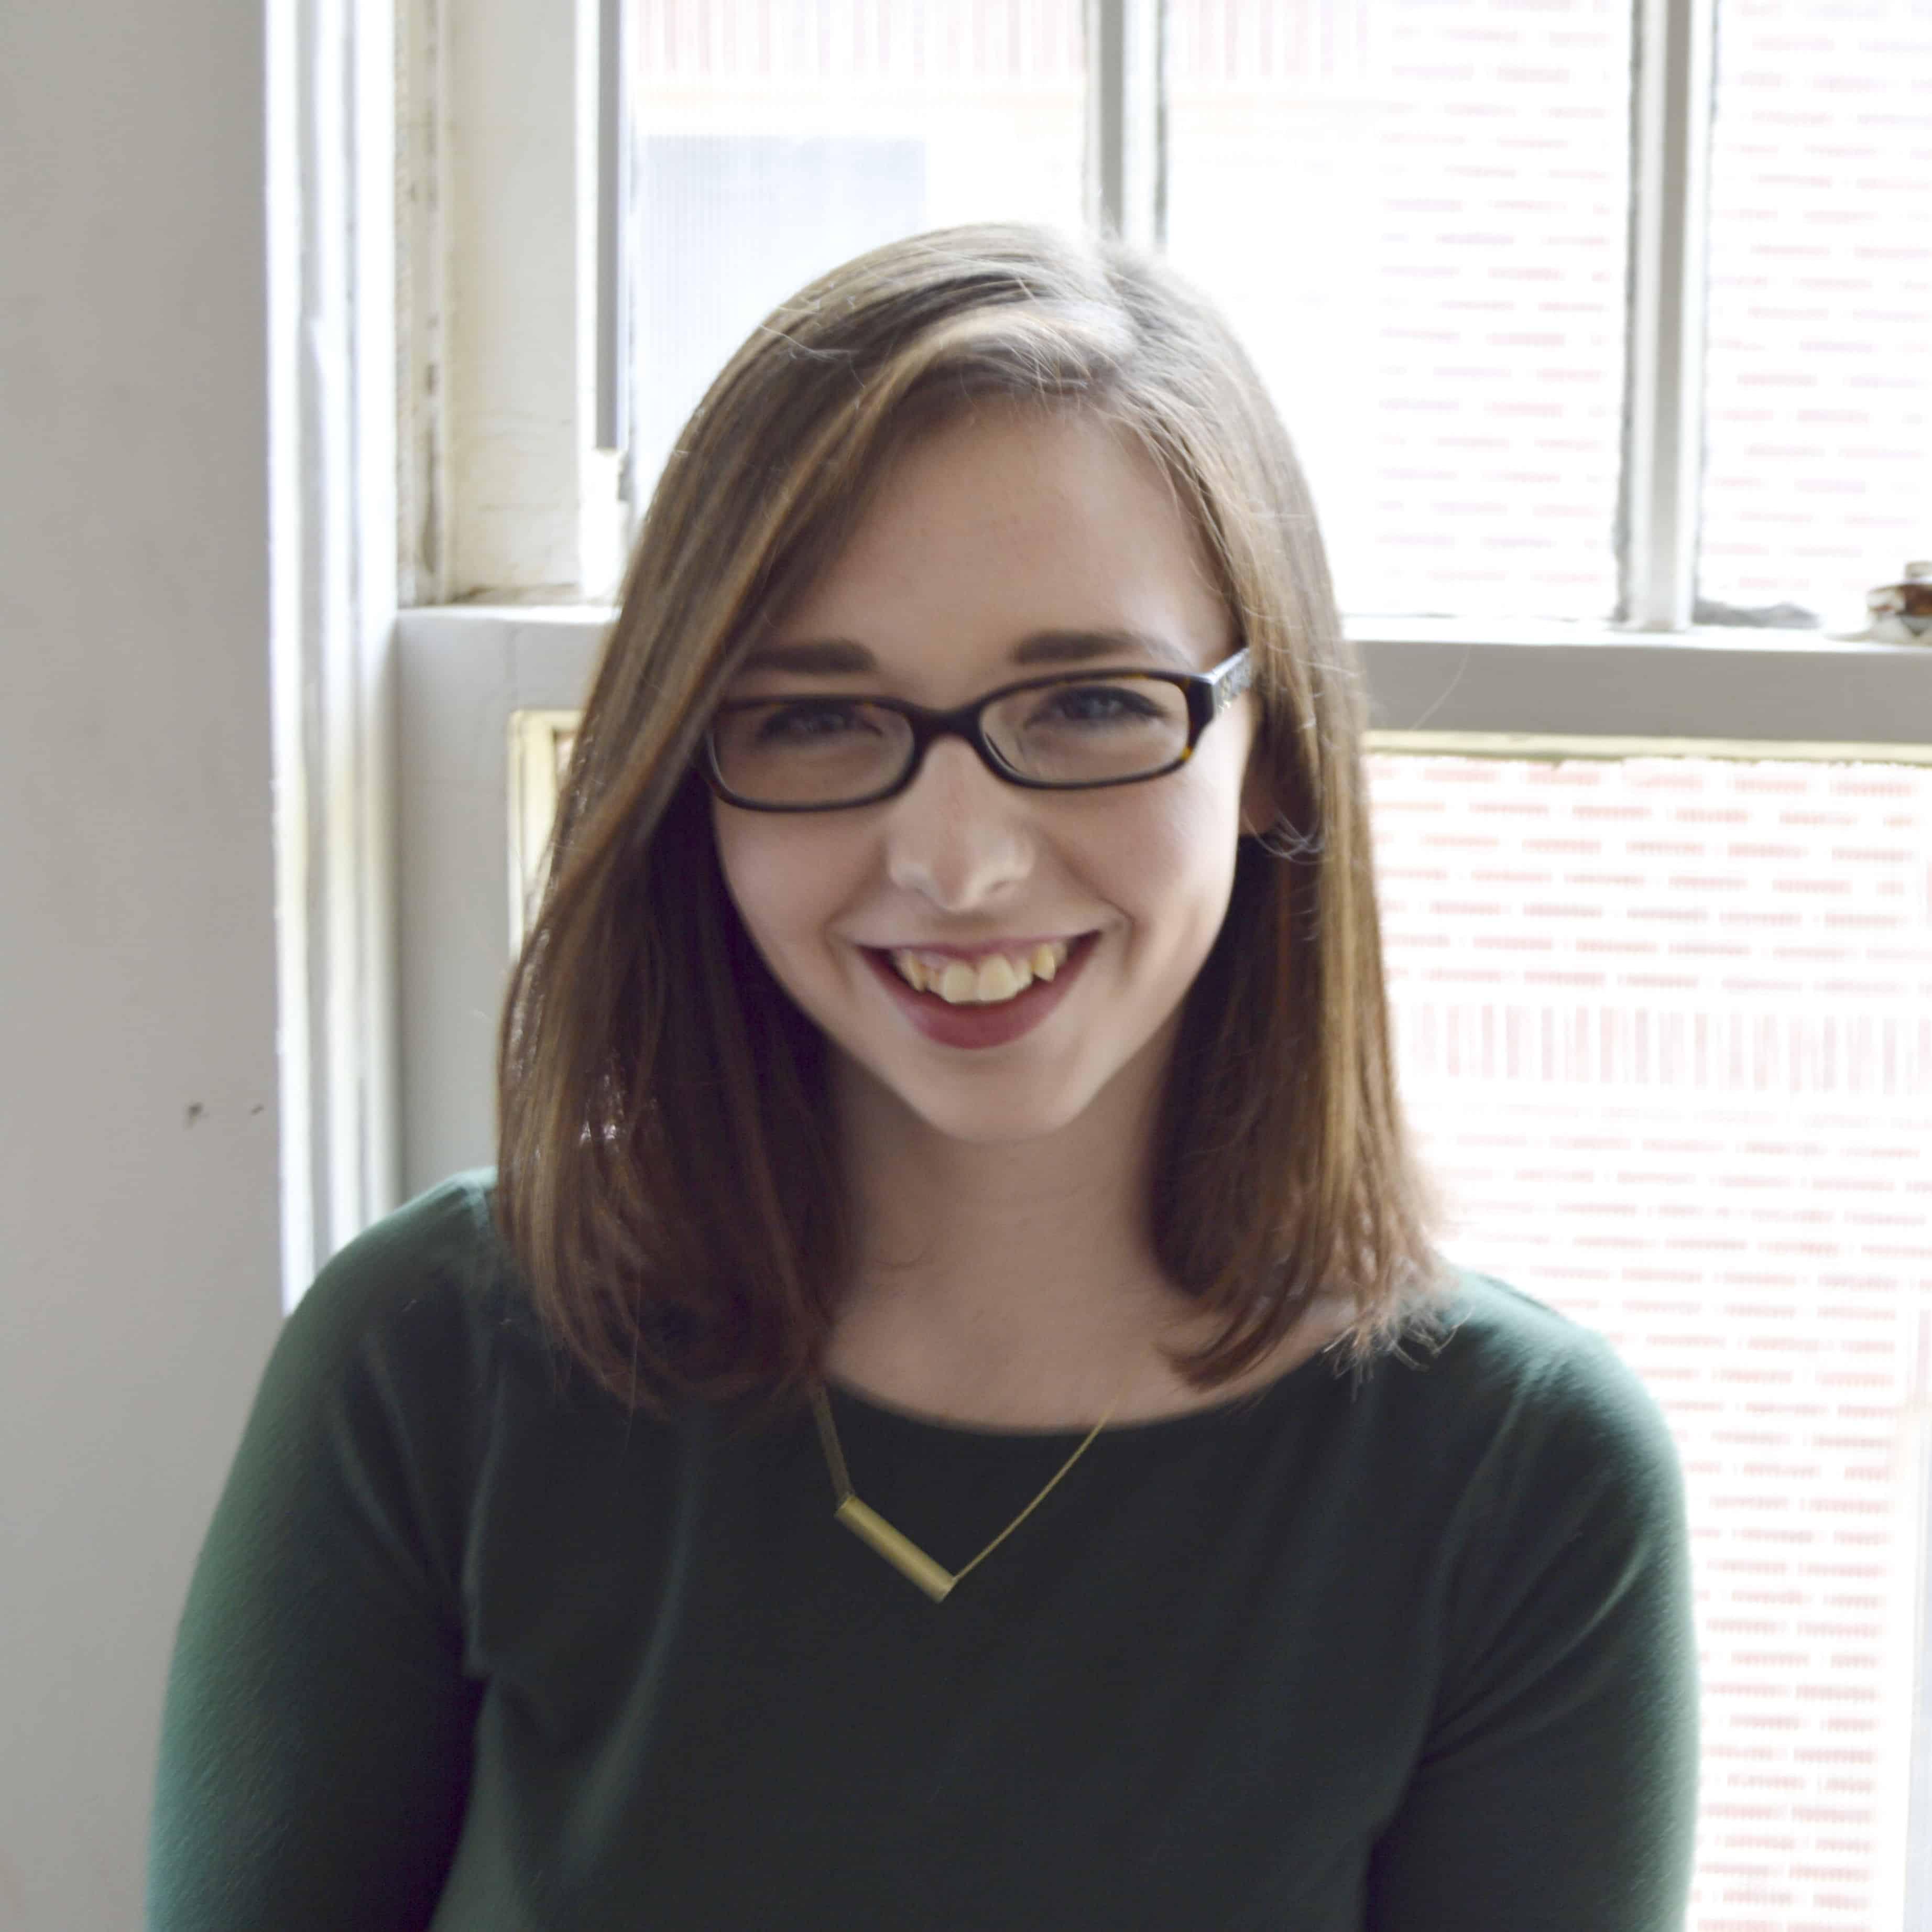 Cassidy Alexander